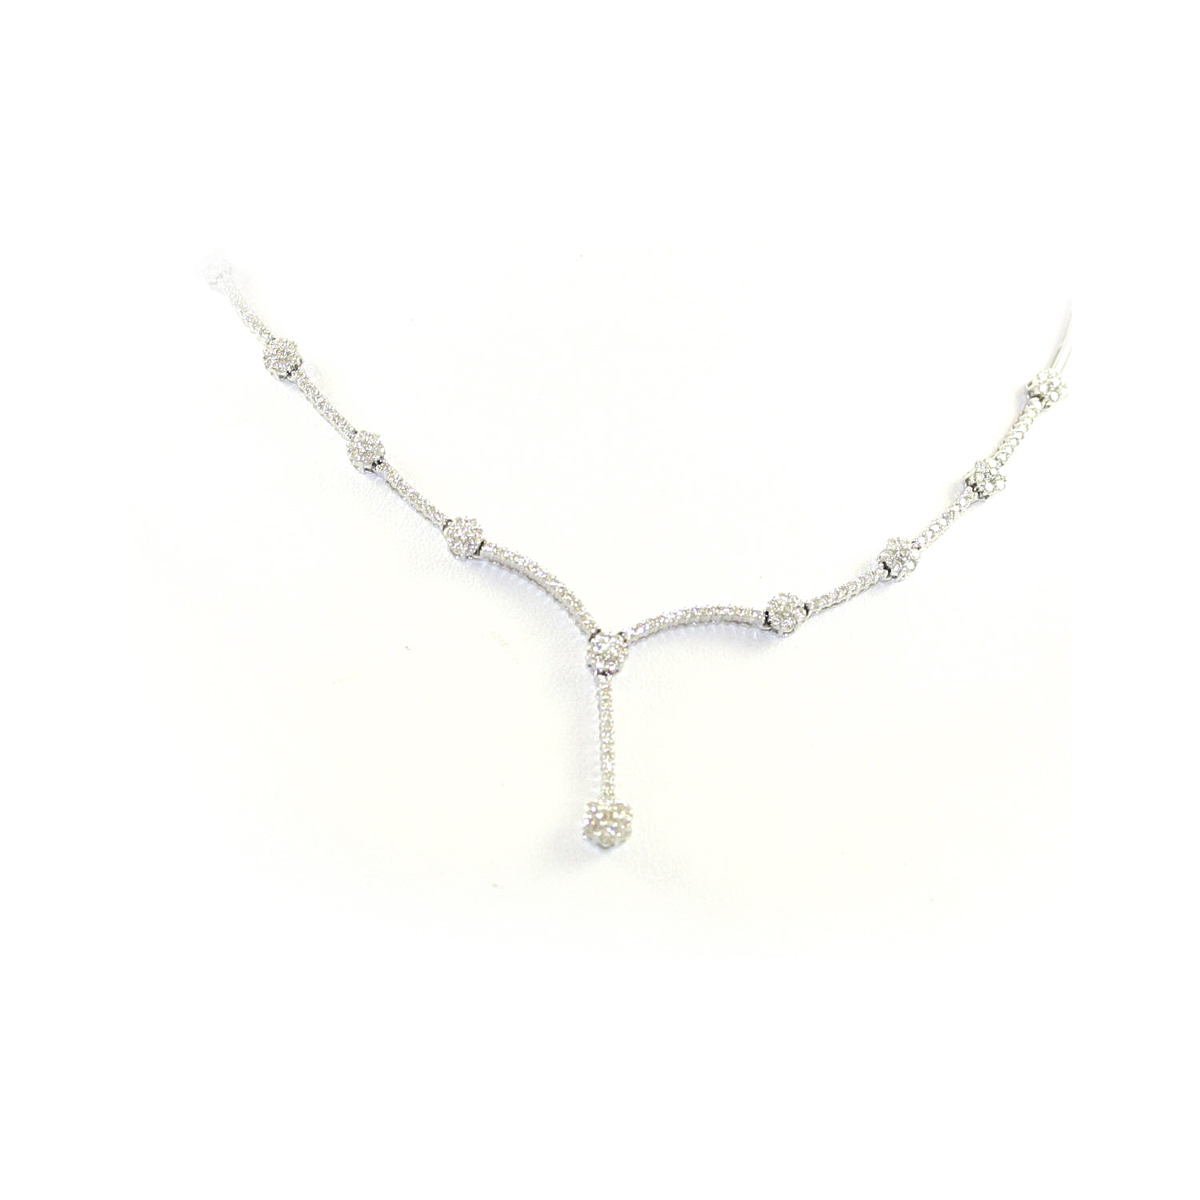 14 Karat White Gold Diamond Bar and Circle Strand Necklace